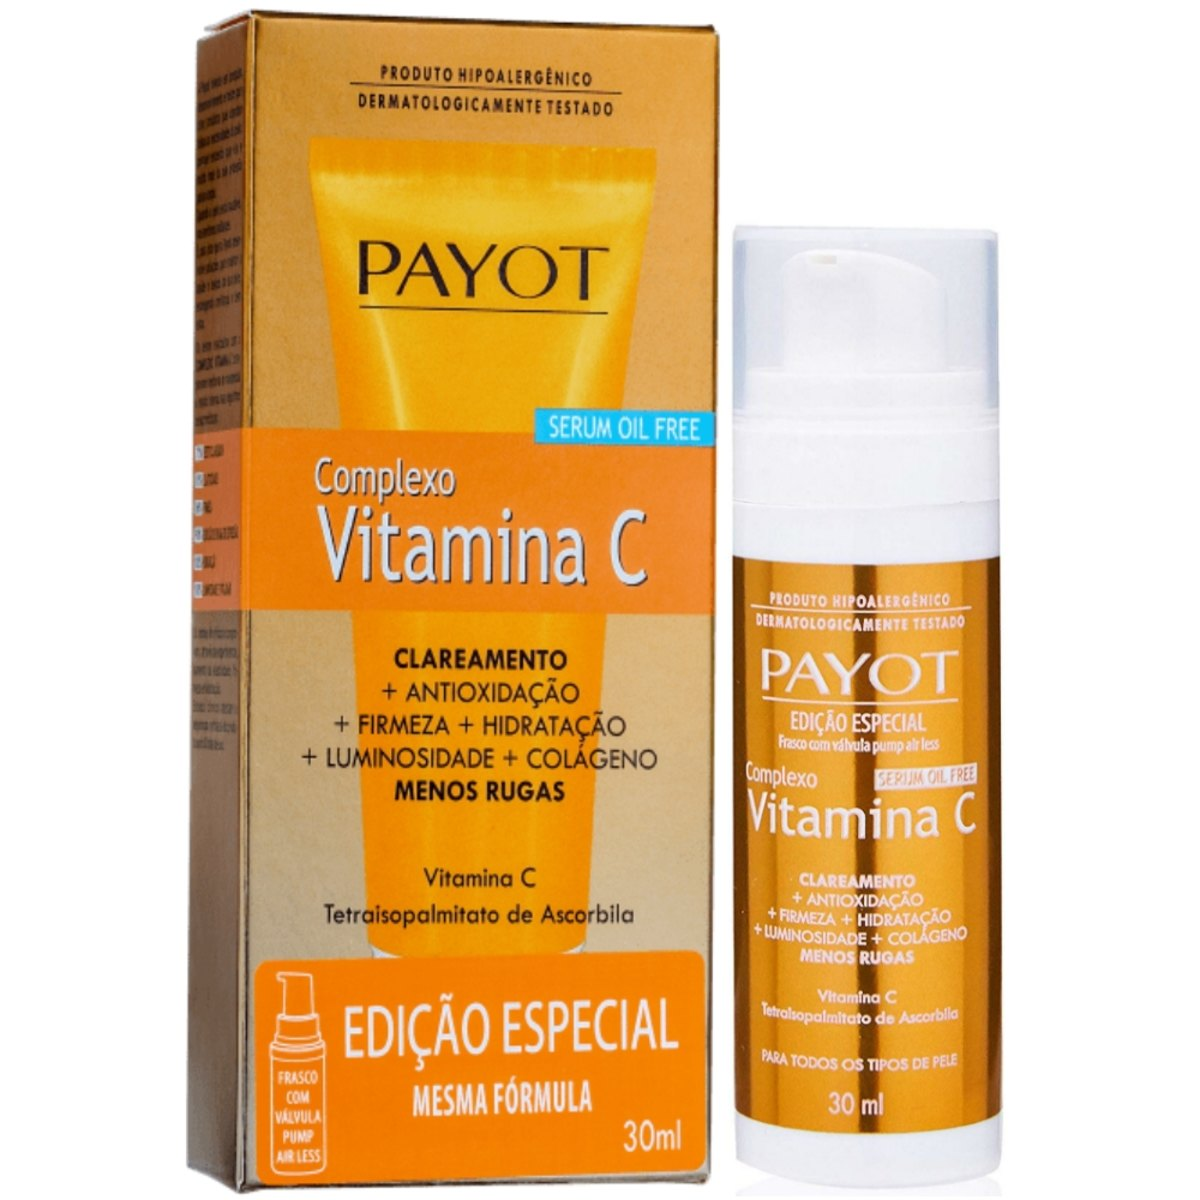 PAYOT COMPLEXO VITAMINA C 30 ML